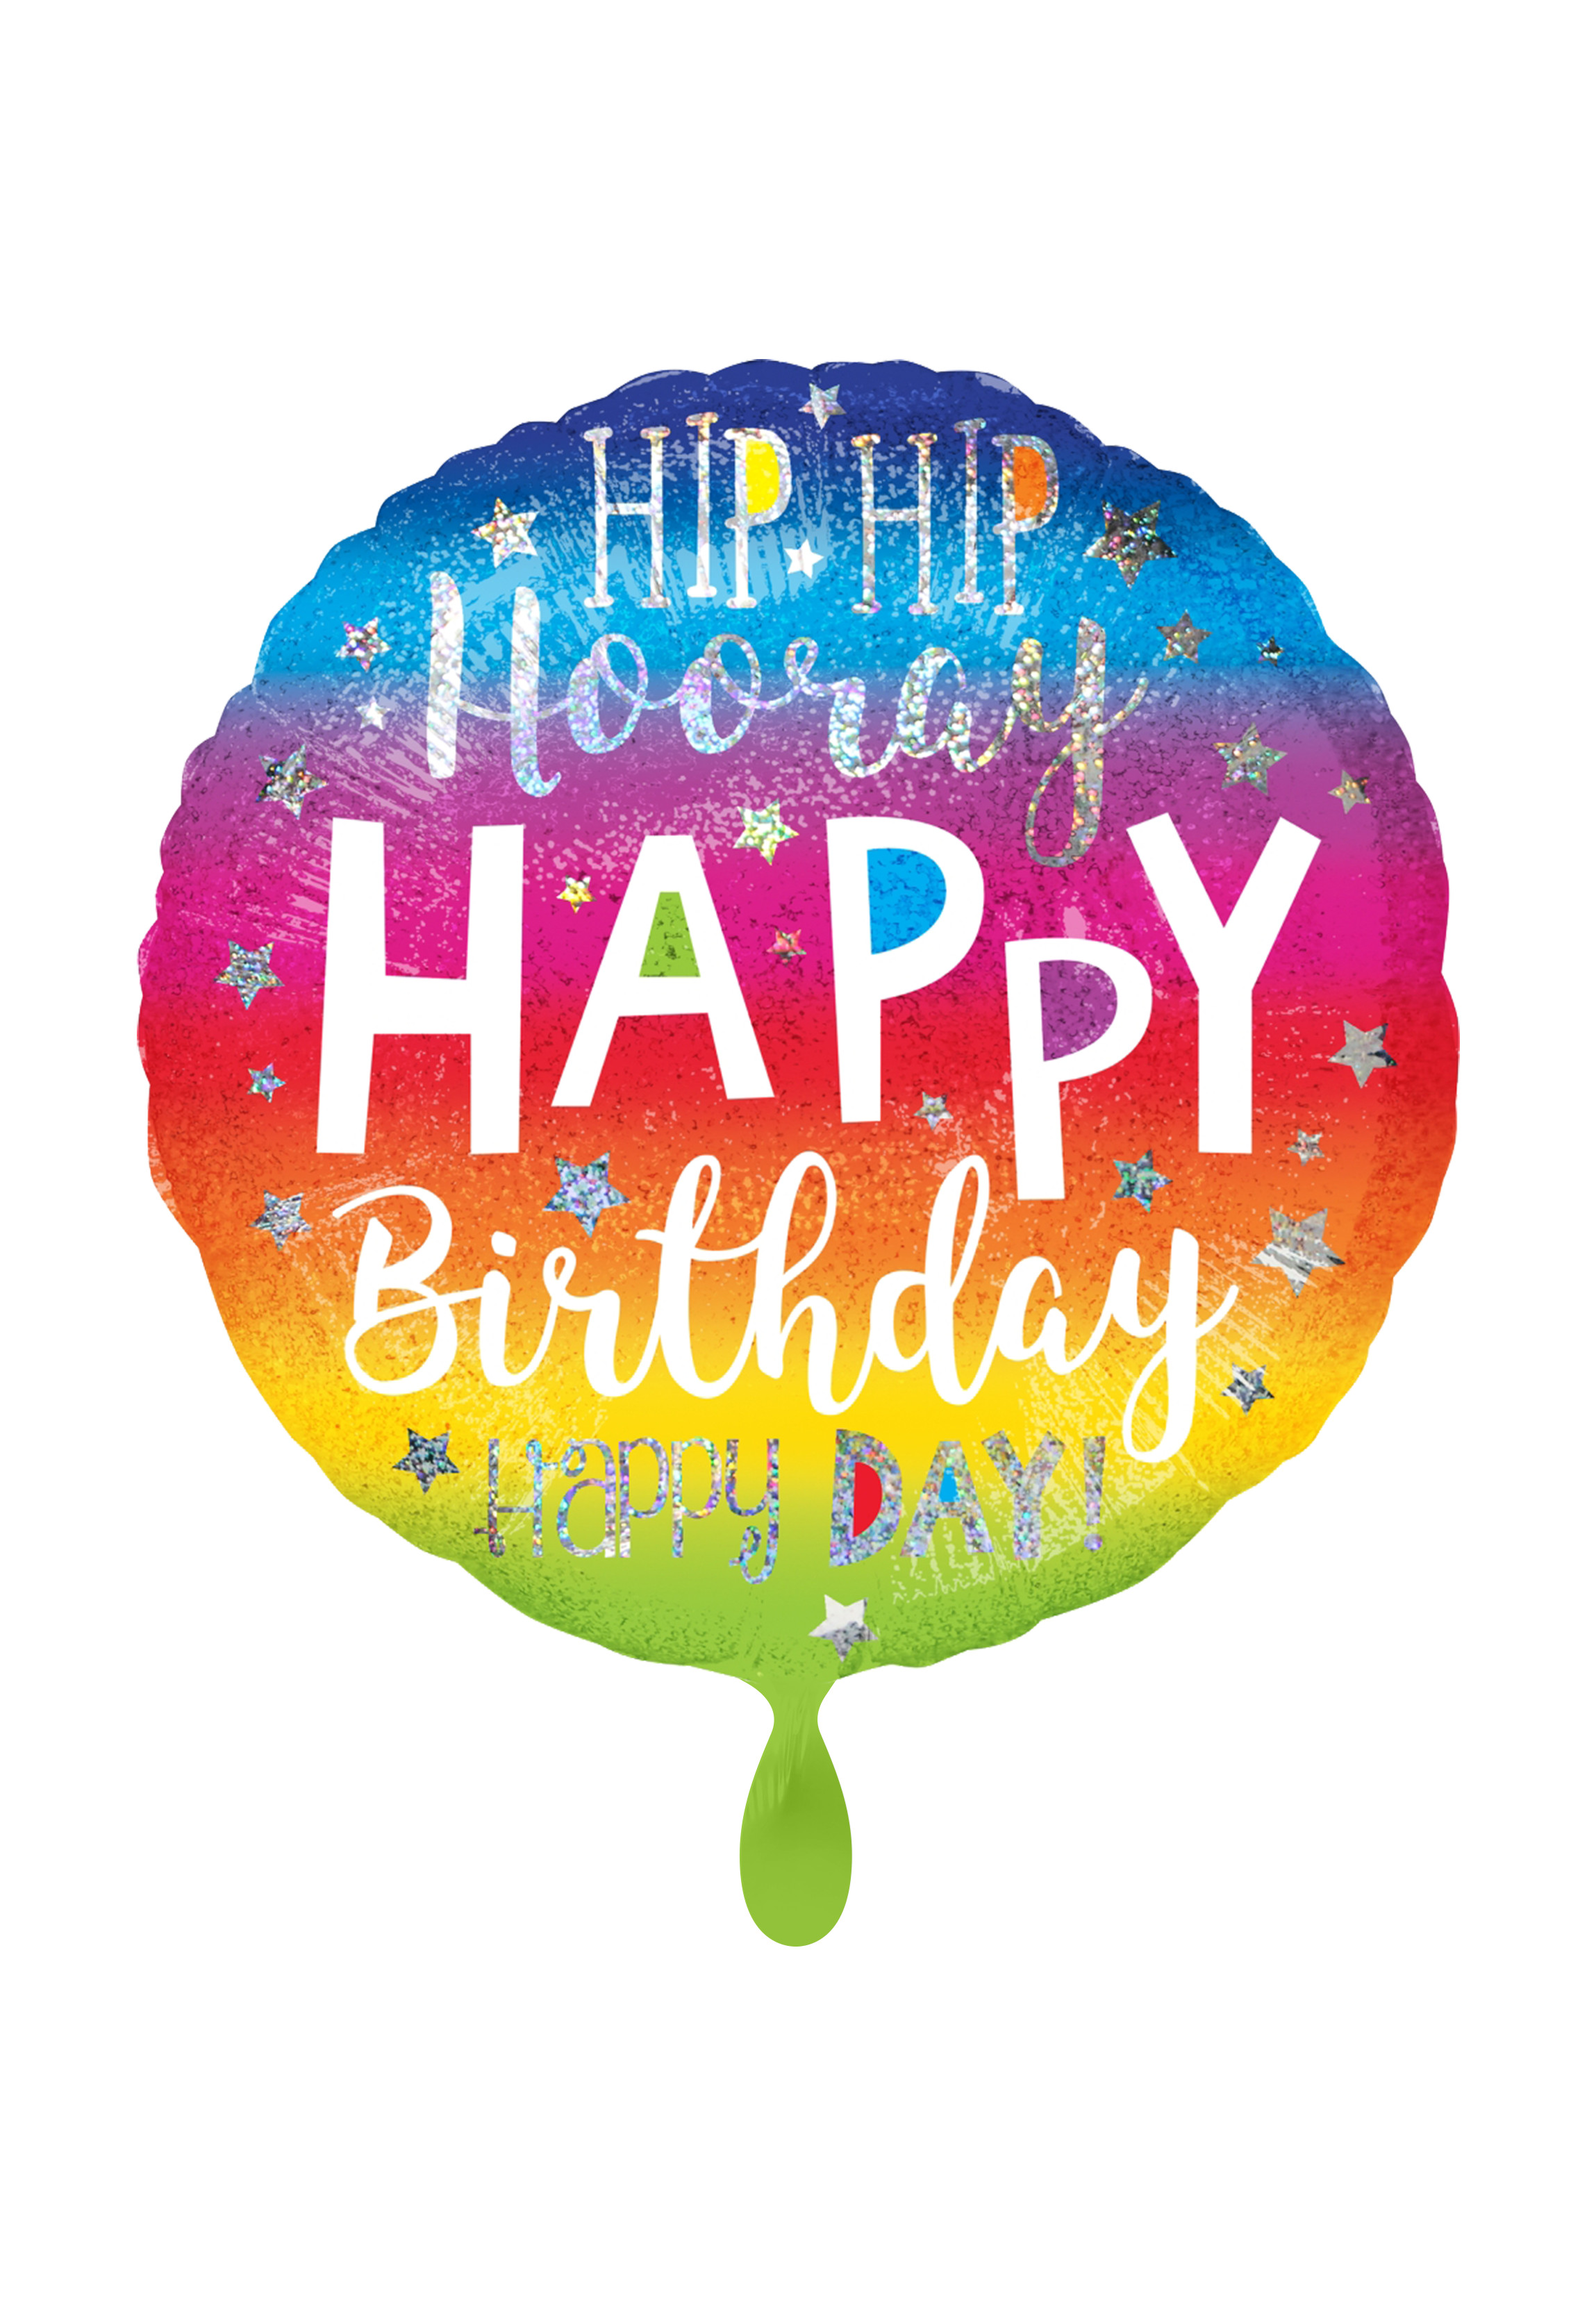 Partydeko Ballon Geburtstag kaufen   Happy Birthday Deko